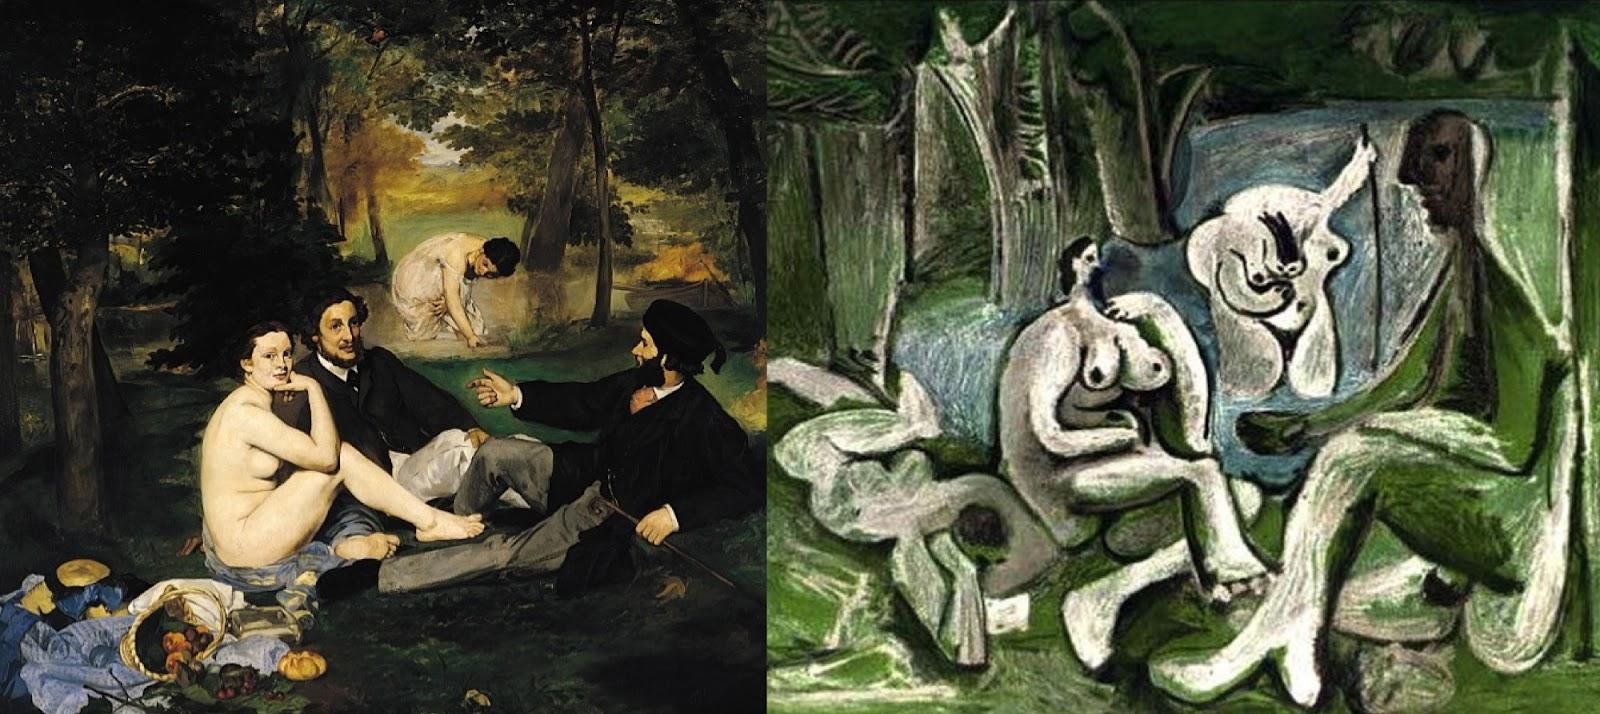 Édouard Manet 1863... Pablo Picasso 1960